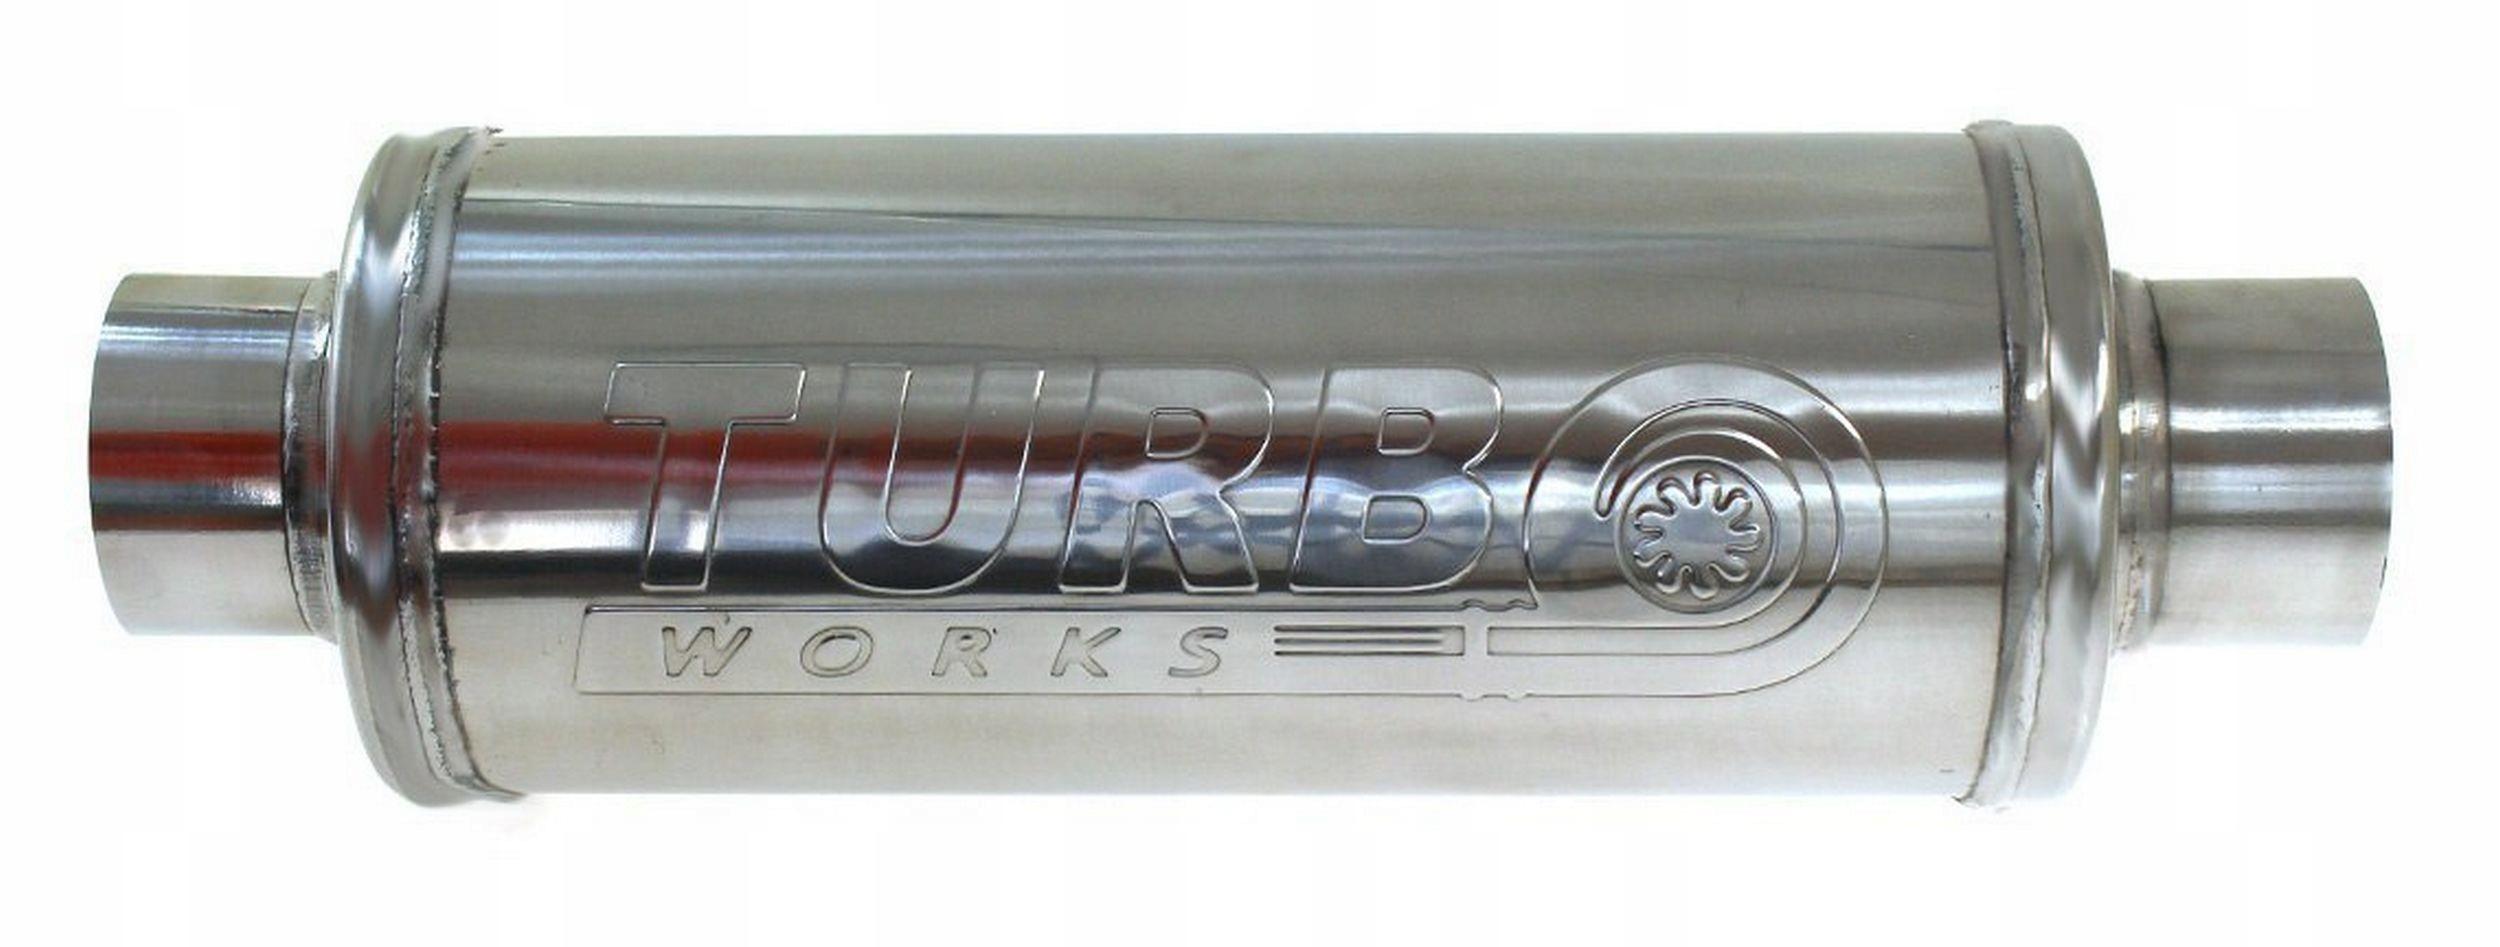 глушитель Средний 2 75'' 300mm спортивный turboworks